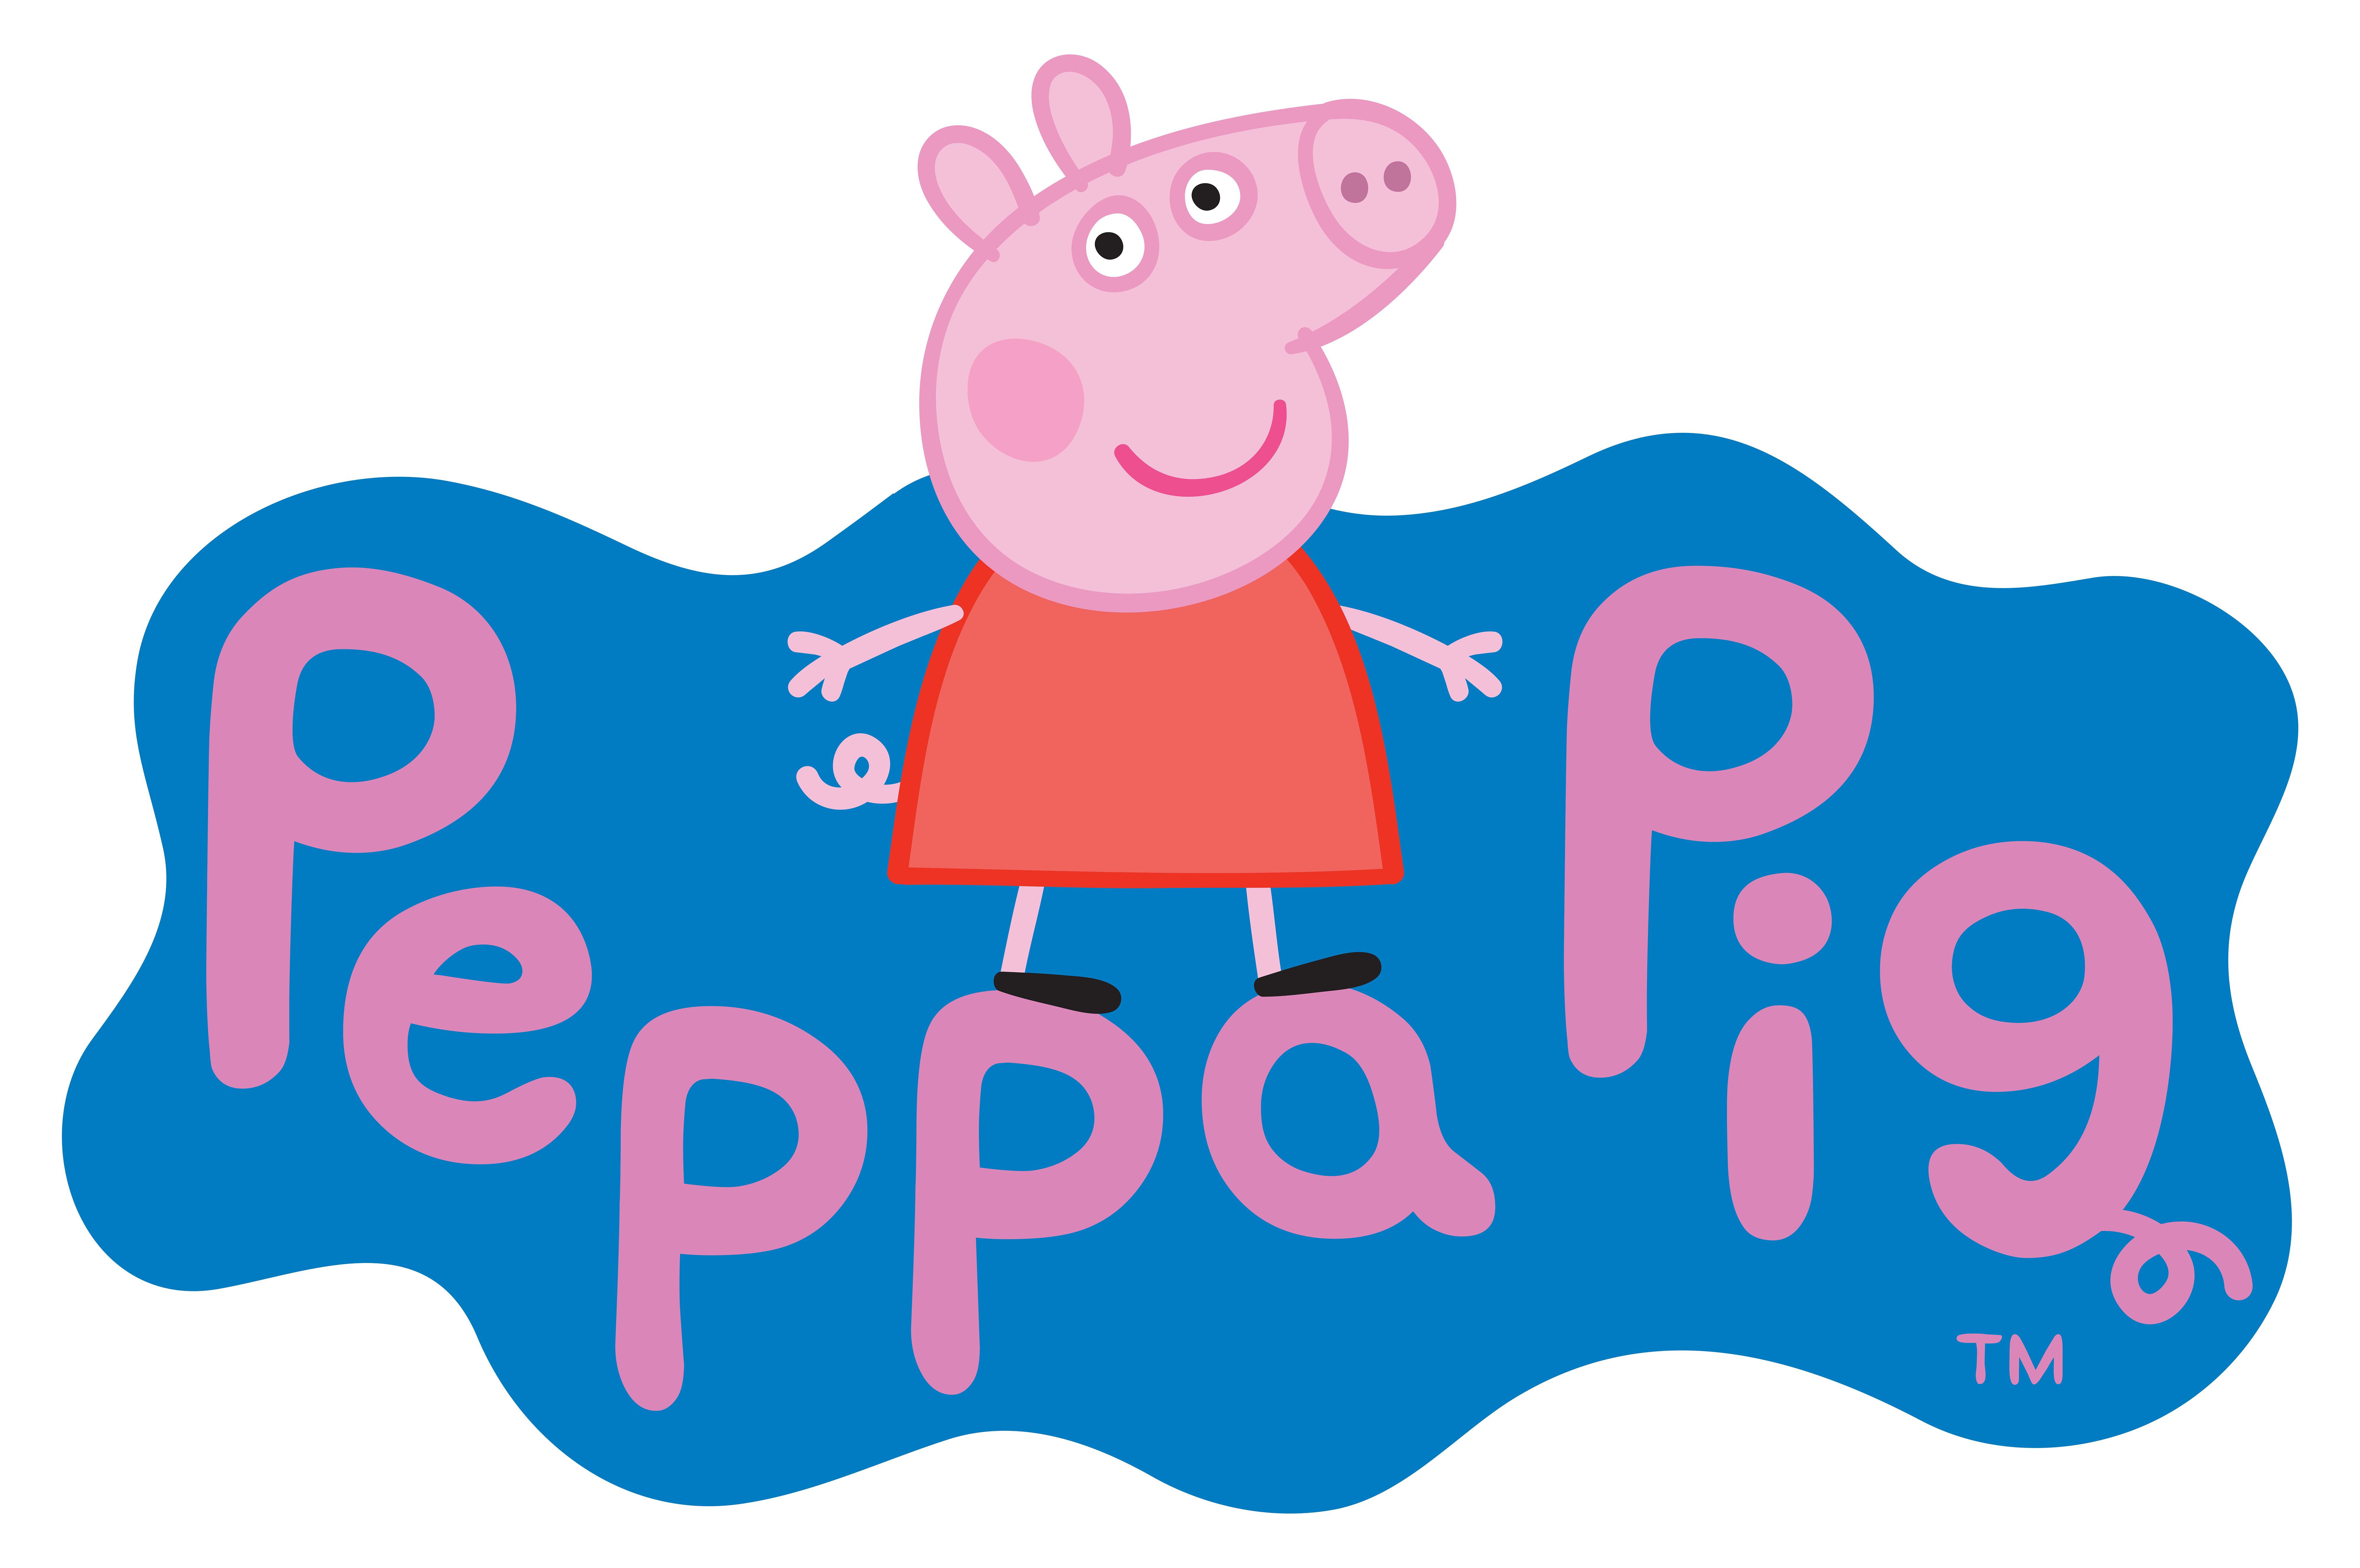 8000x5316 Peppa Pig Logo Transparent Png Clip Art Imageu200b Gallery